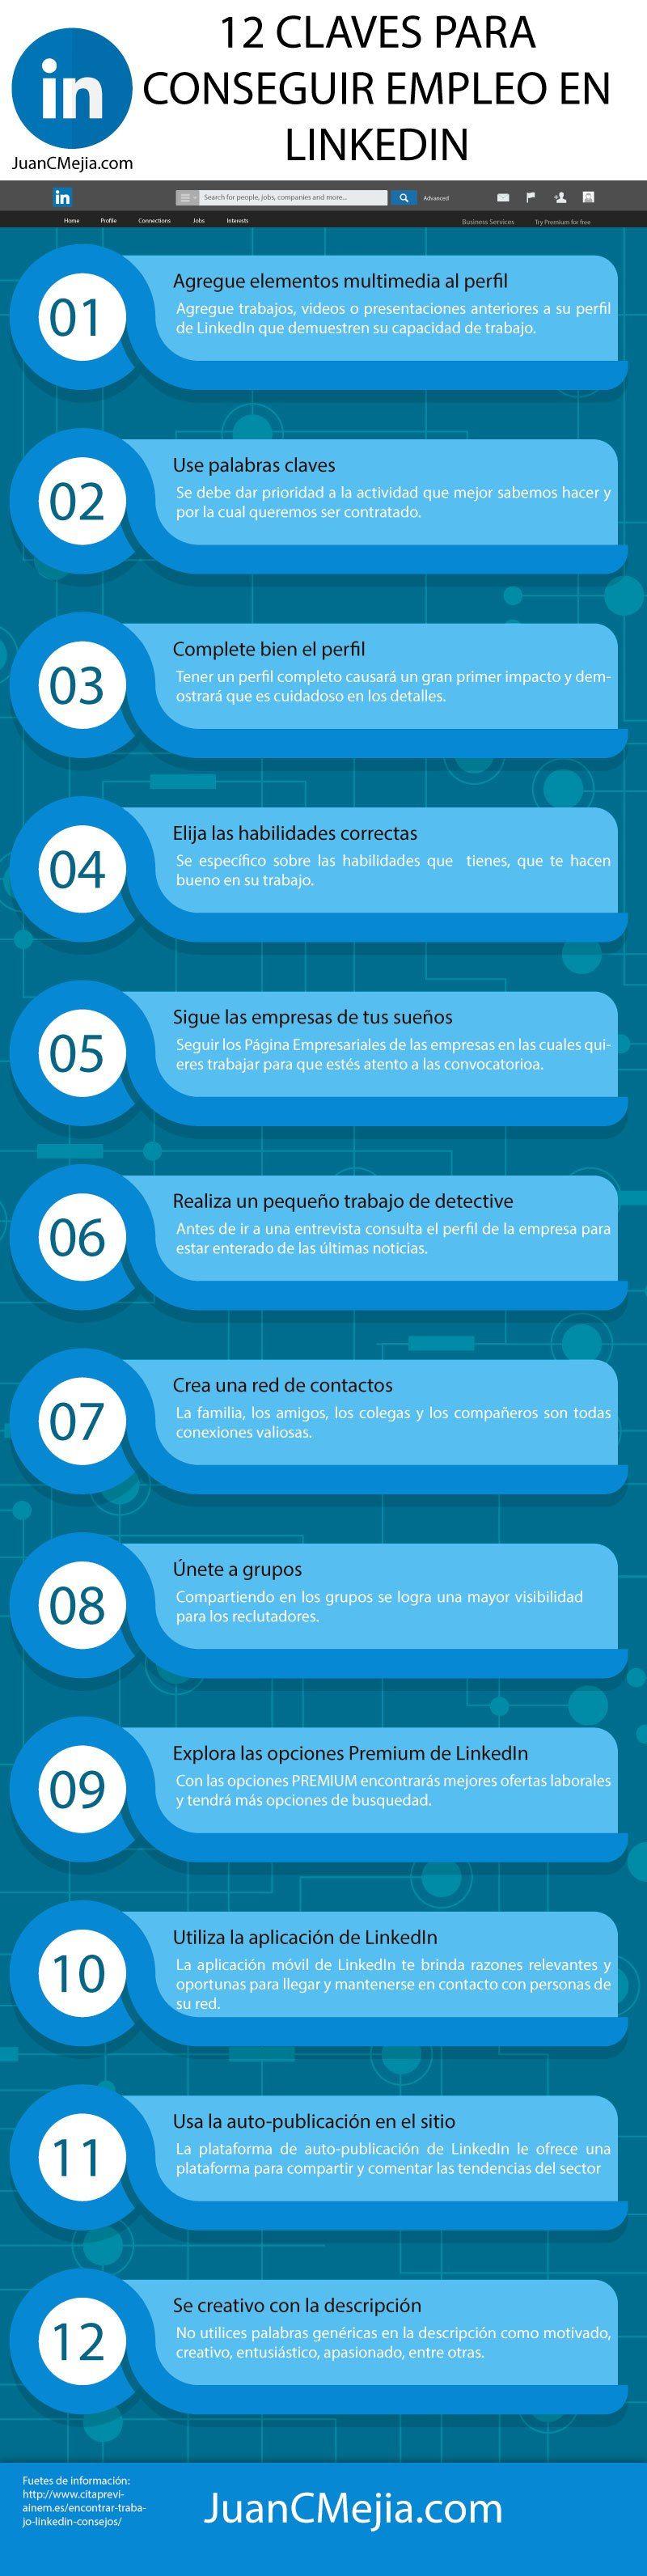 12 Claves Para Conseguir Empleo En Linkedin Infografia Empleo Socialmedia Como Encontrar Trabajo Buscar Empleo Y Encontrar Trabajo